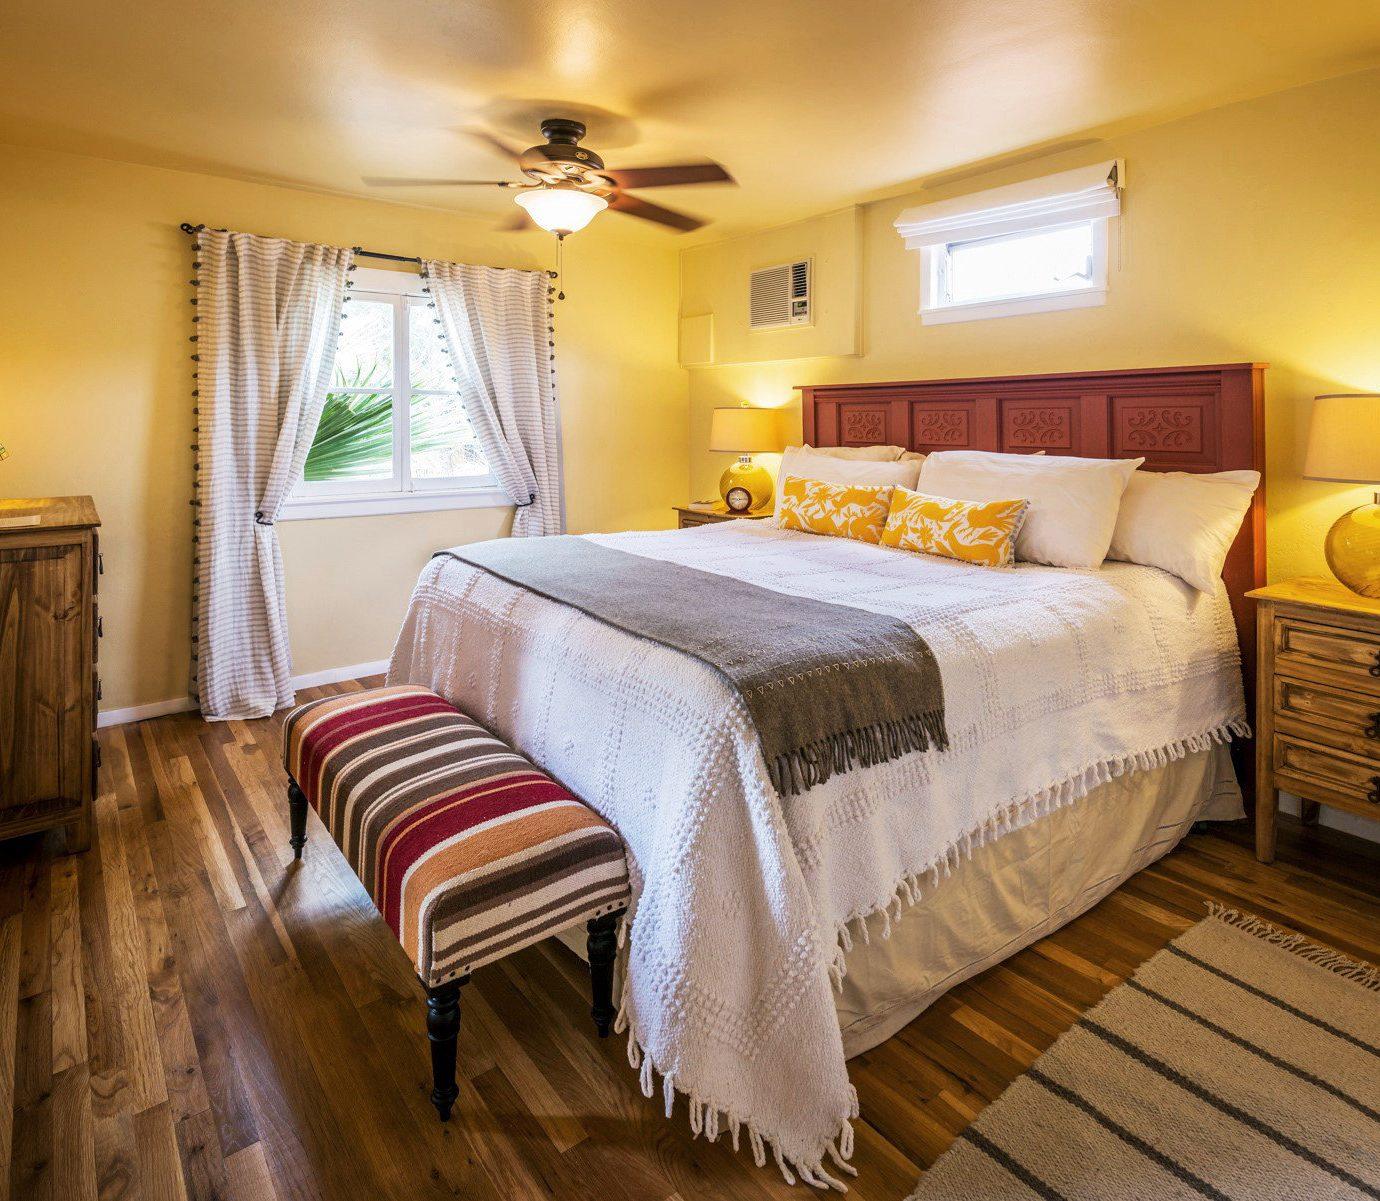 B&B Bedroom Country Lodge Romantic Wellness property cottage Suite hardwood